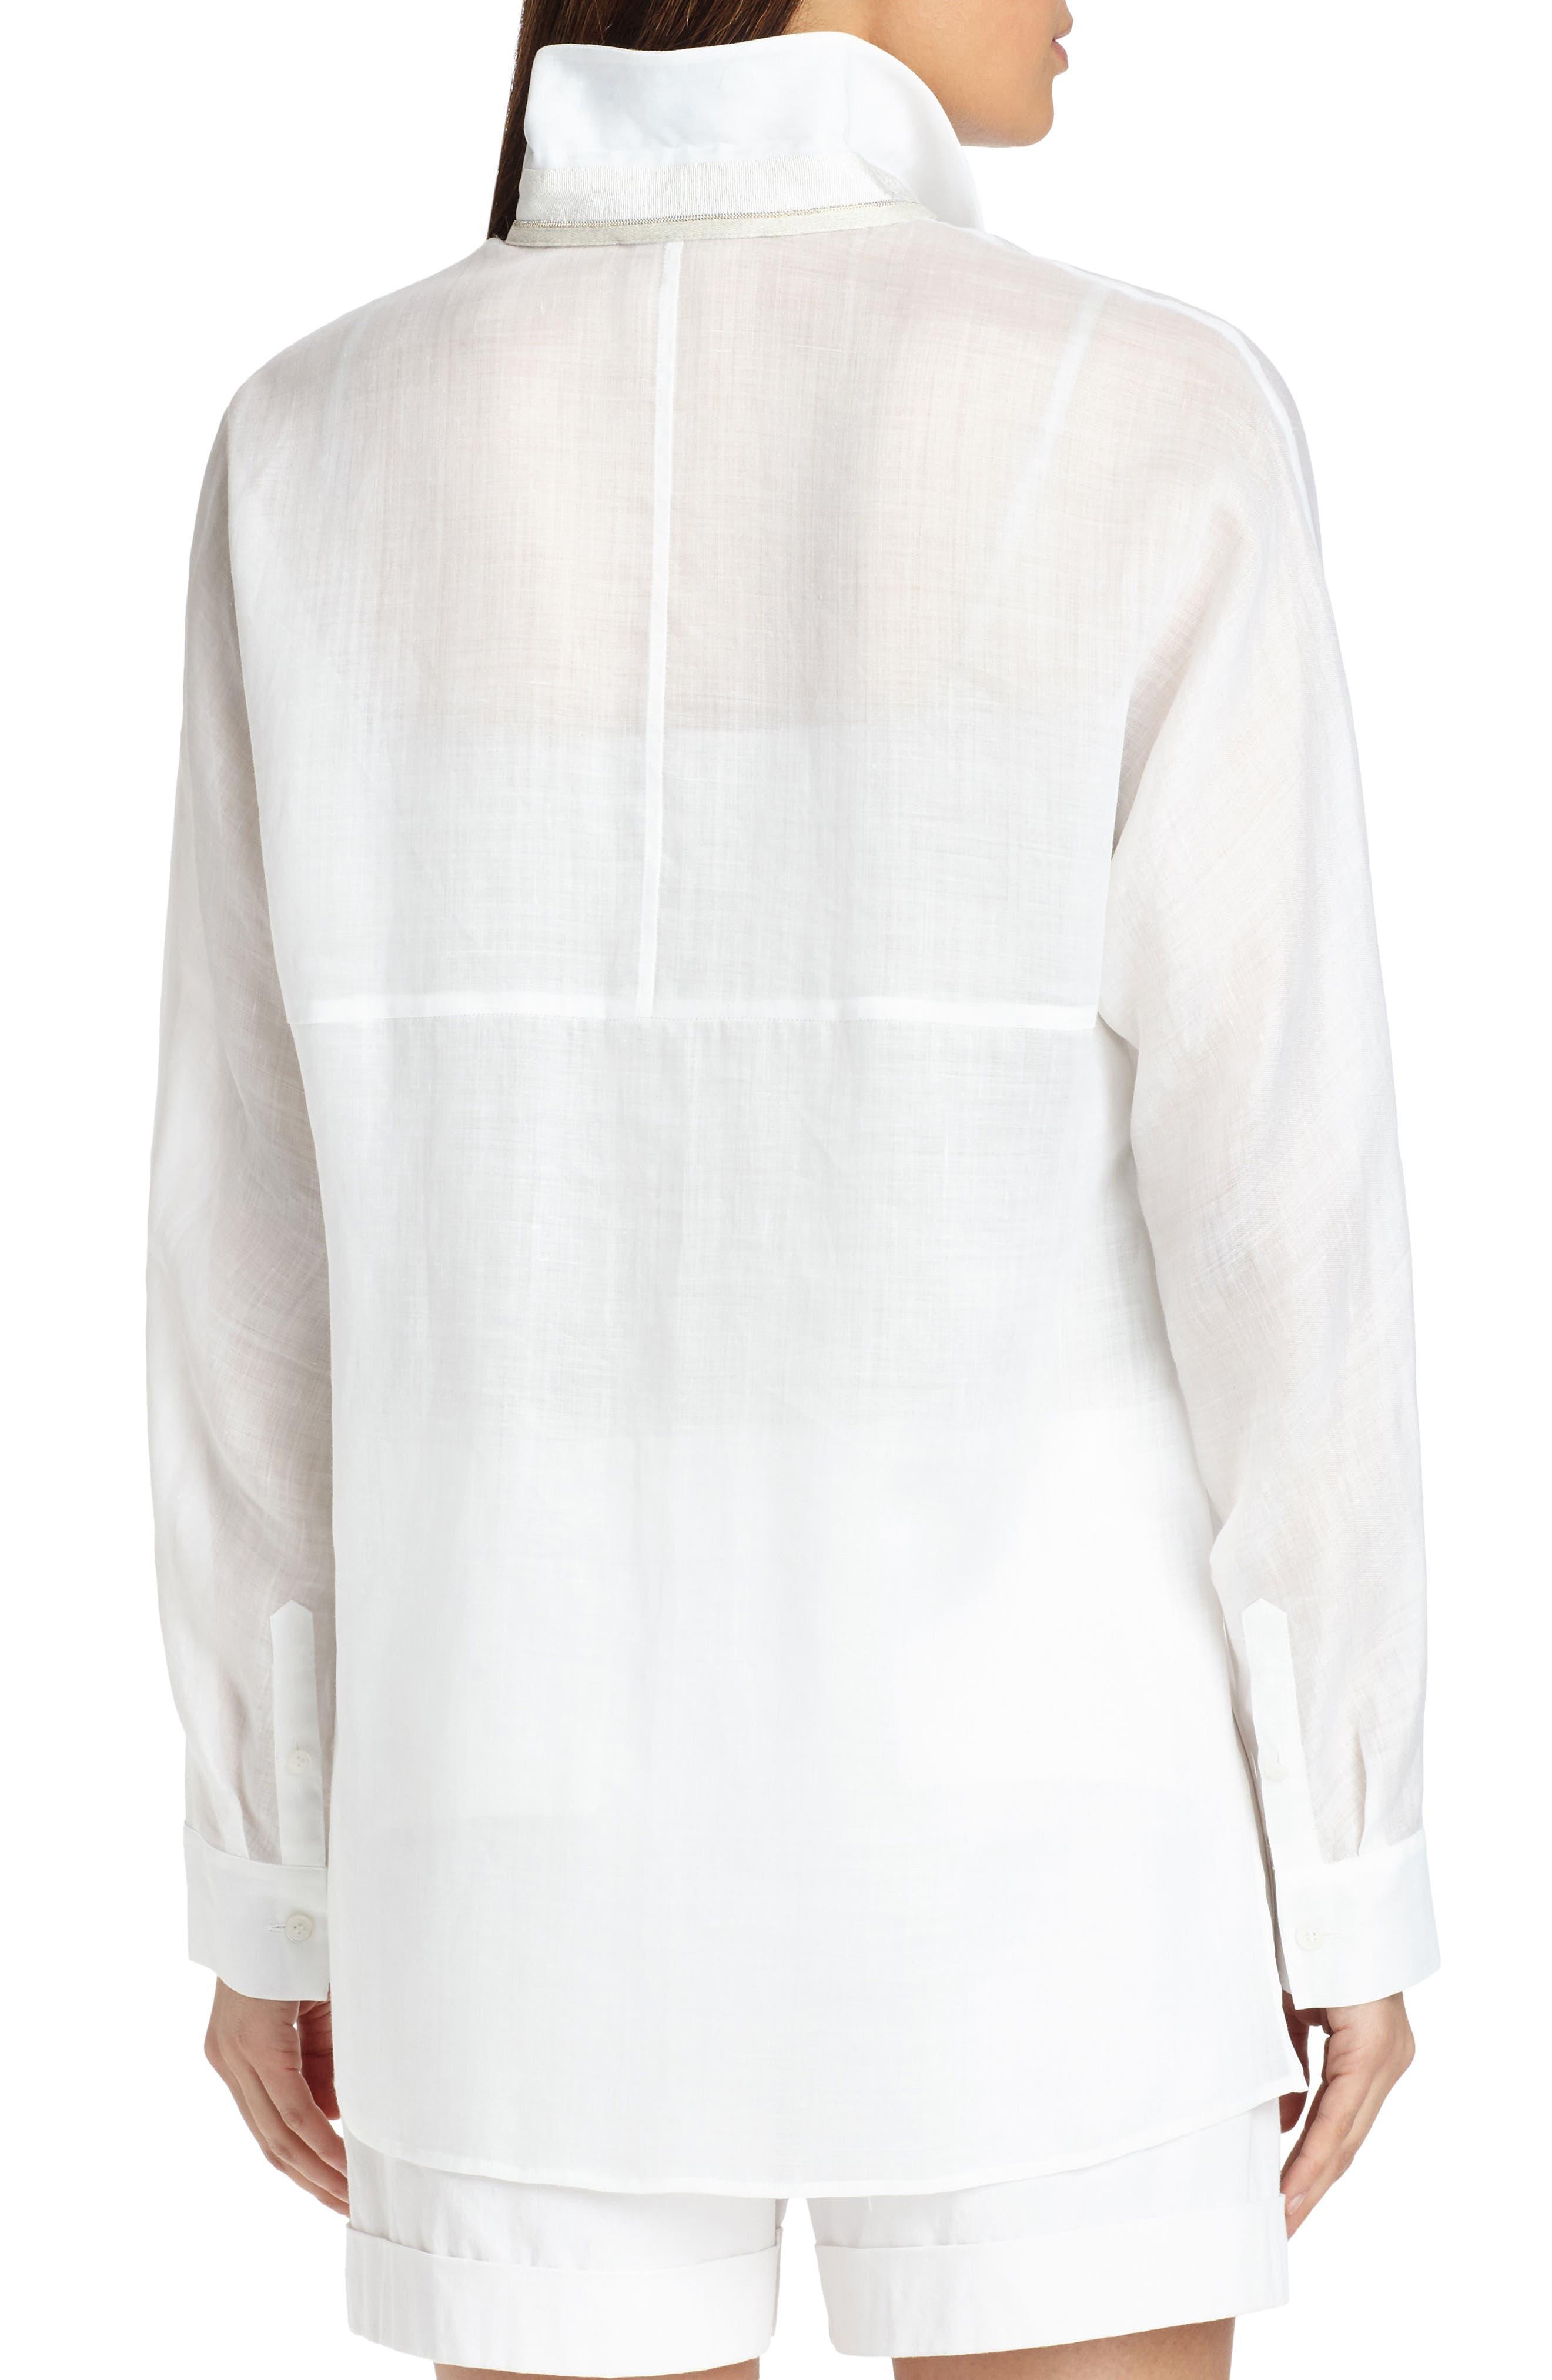 Alyssa Gemma Cloth Blouse,                             Alternate thumbnail 2, color,                             White